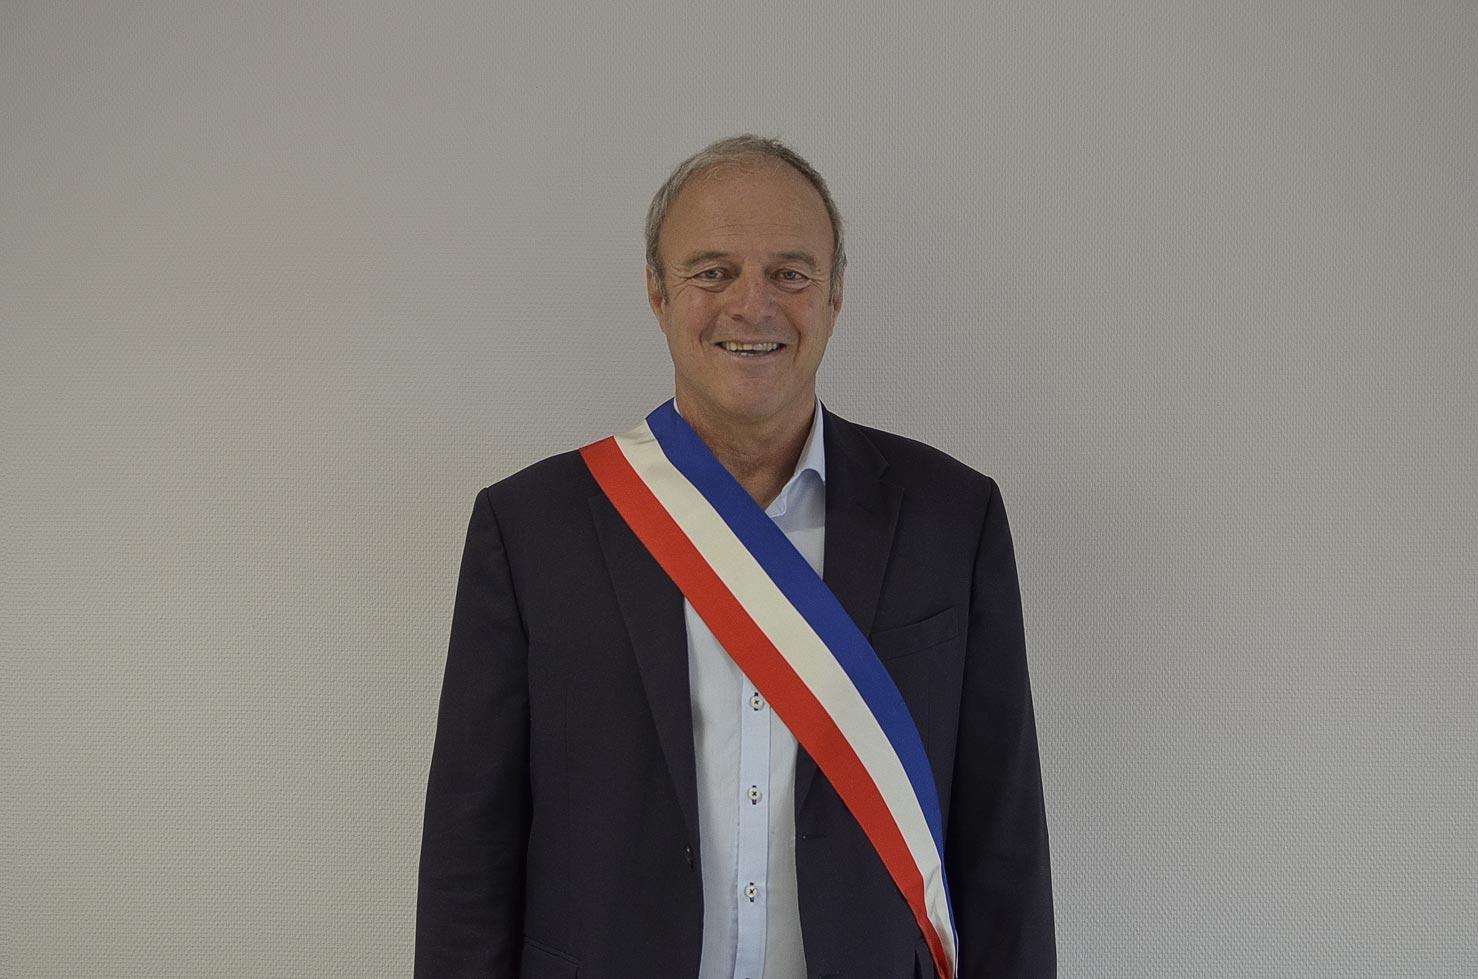 Didier Achalme